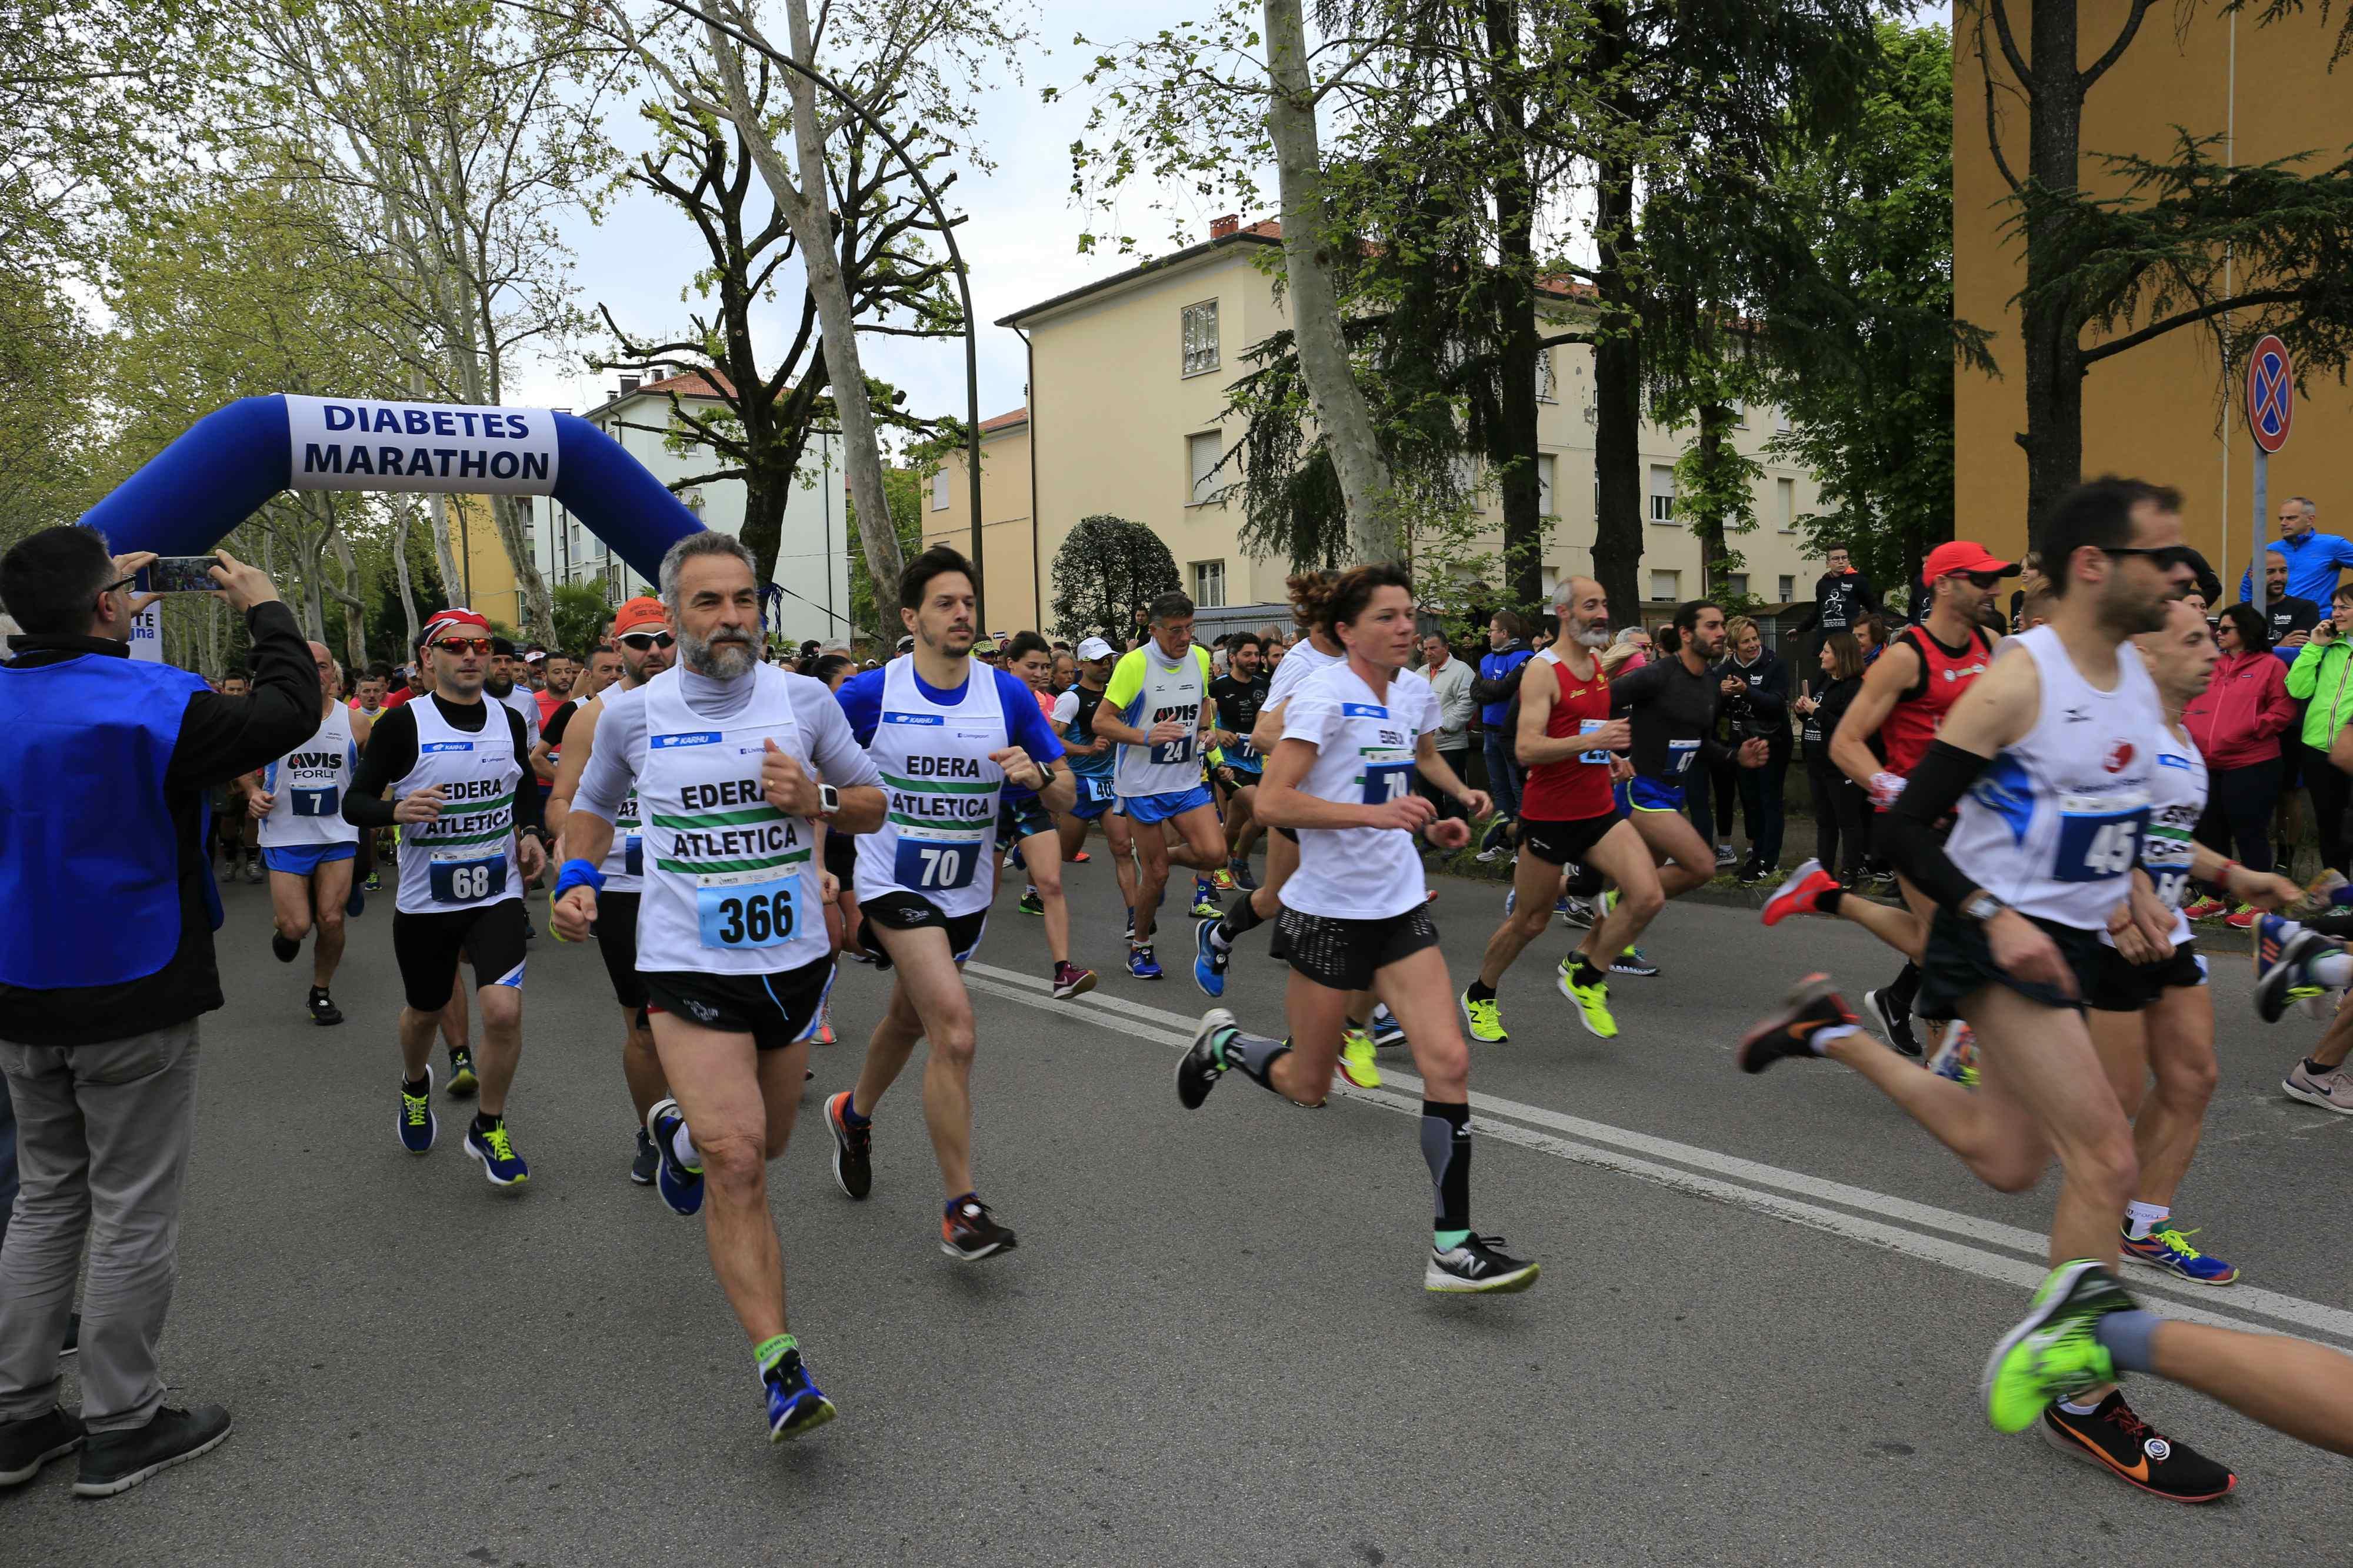 Diabetes-Marathon